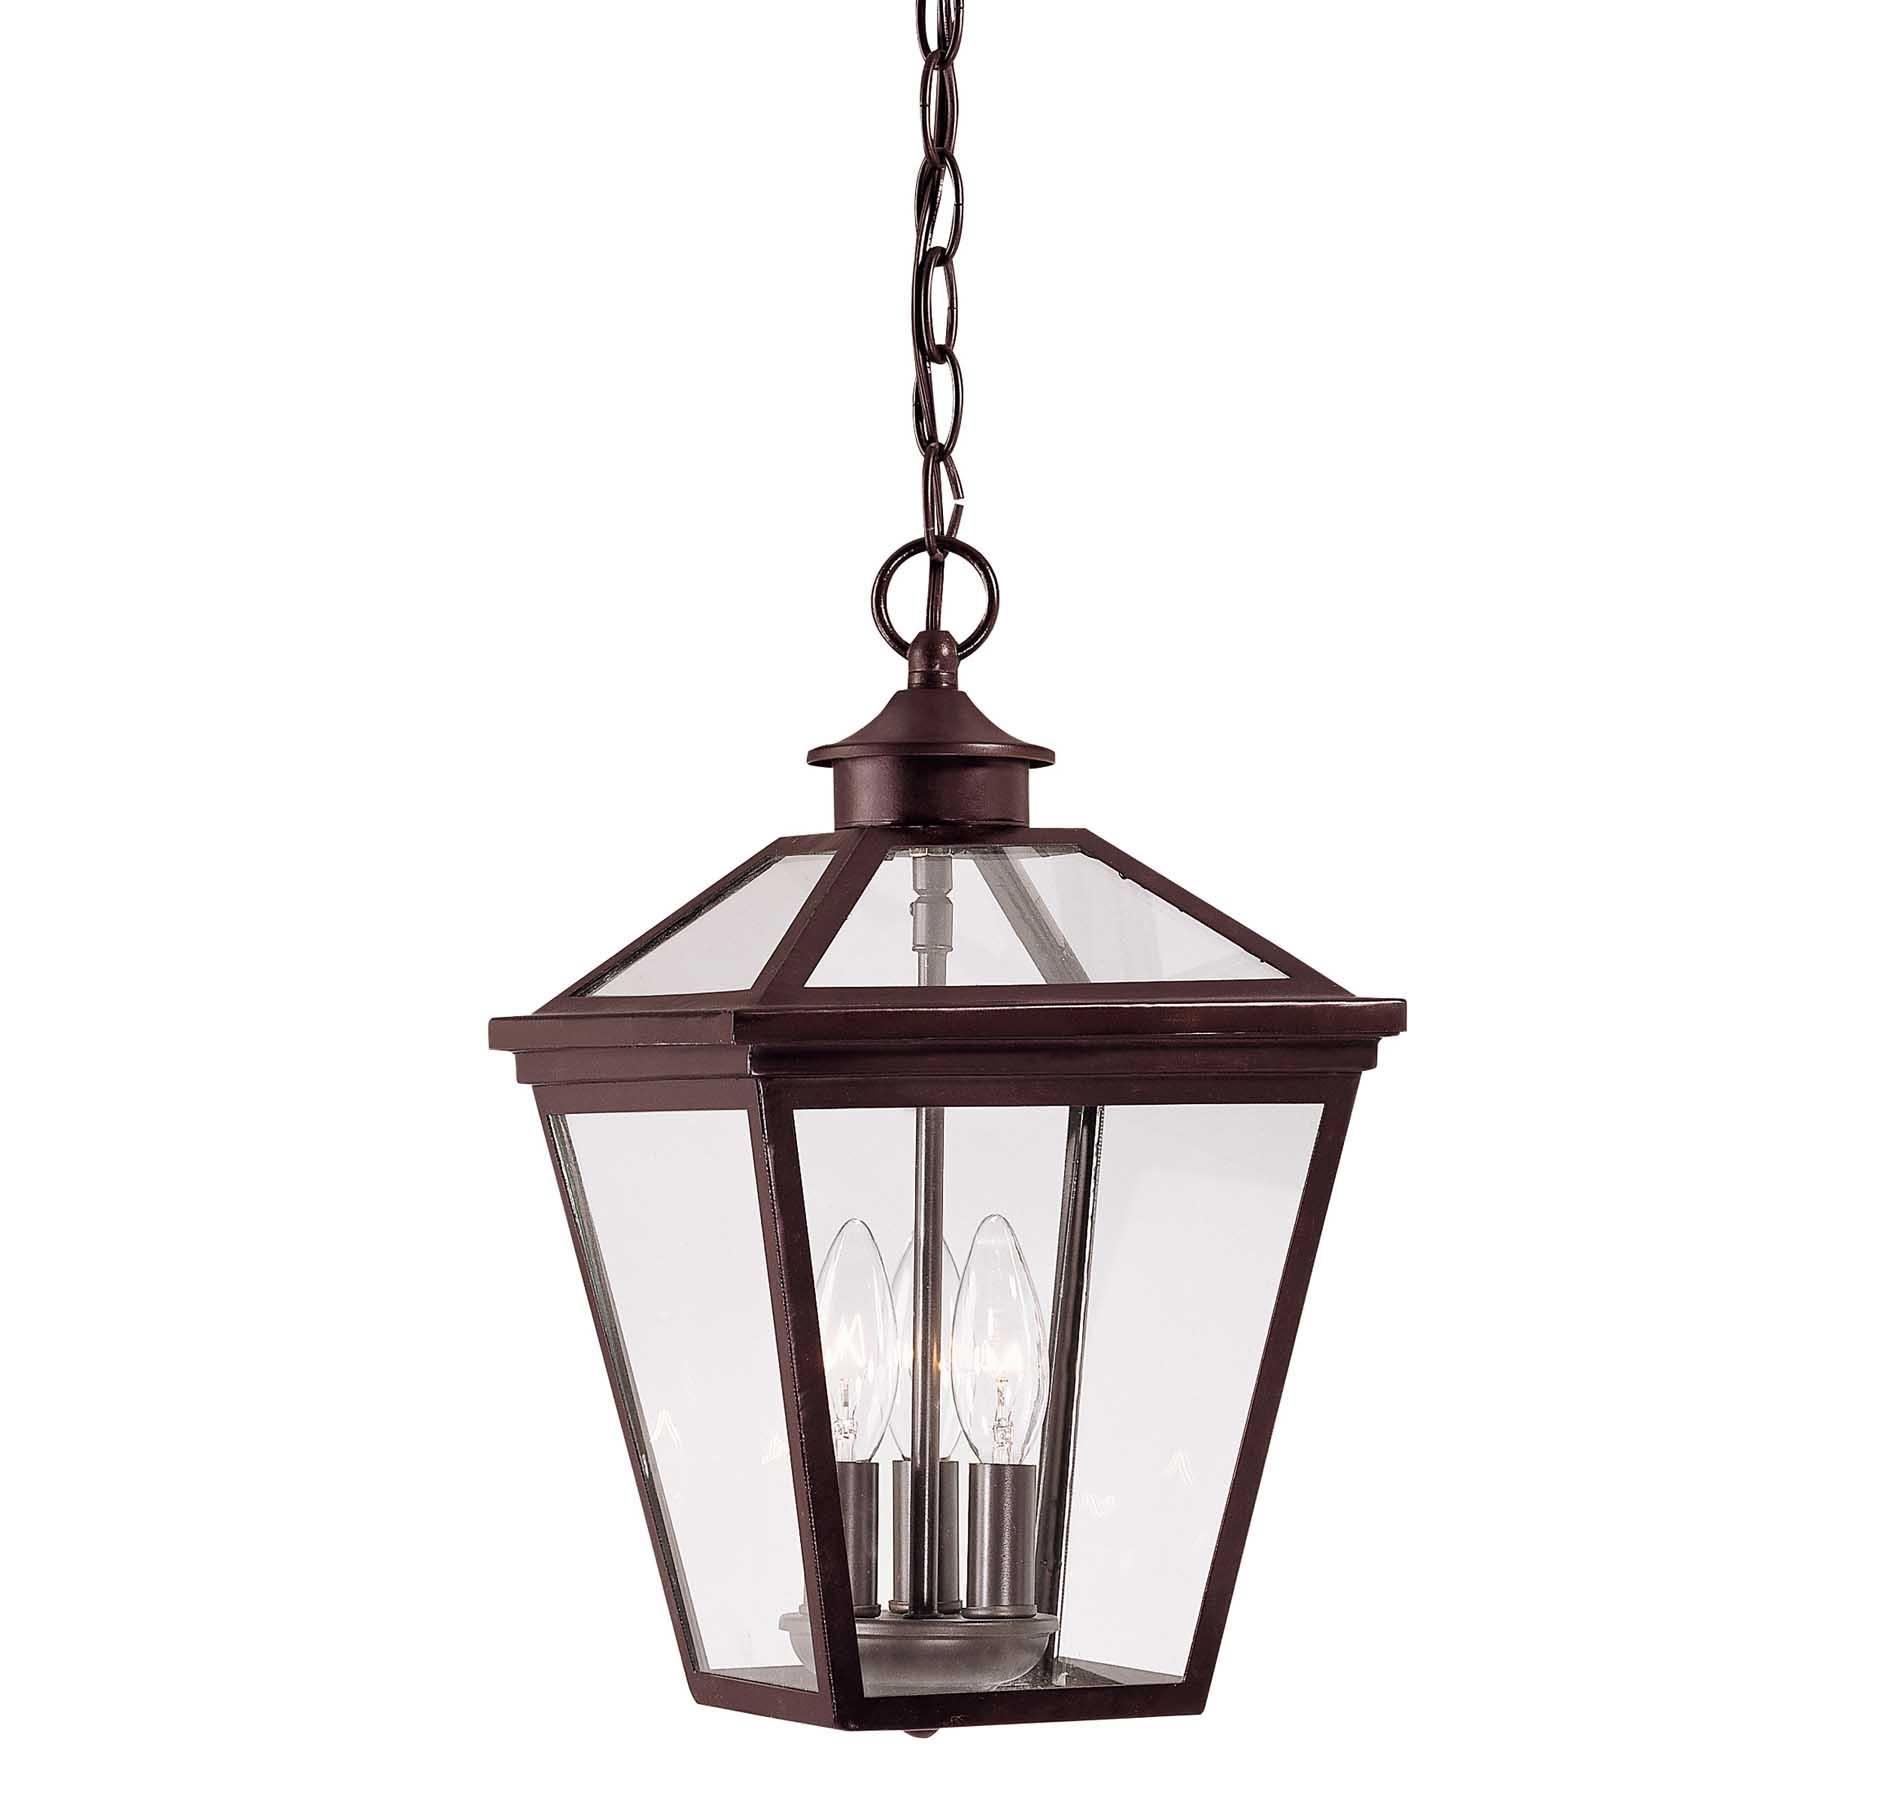 Savoy House 5-146-13 Ellijay Hanging Lantern in Outdoor Lights, Outdoor Hanging Lights: LightsOnline.com